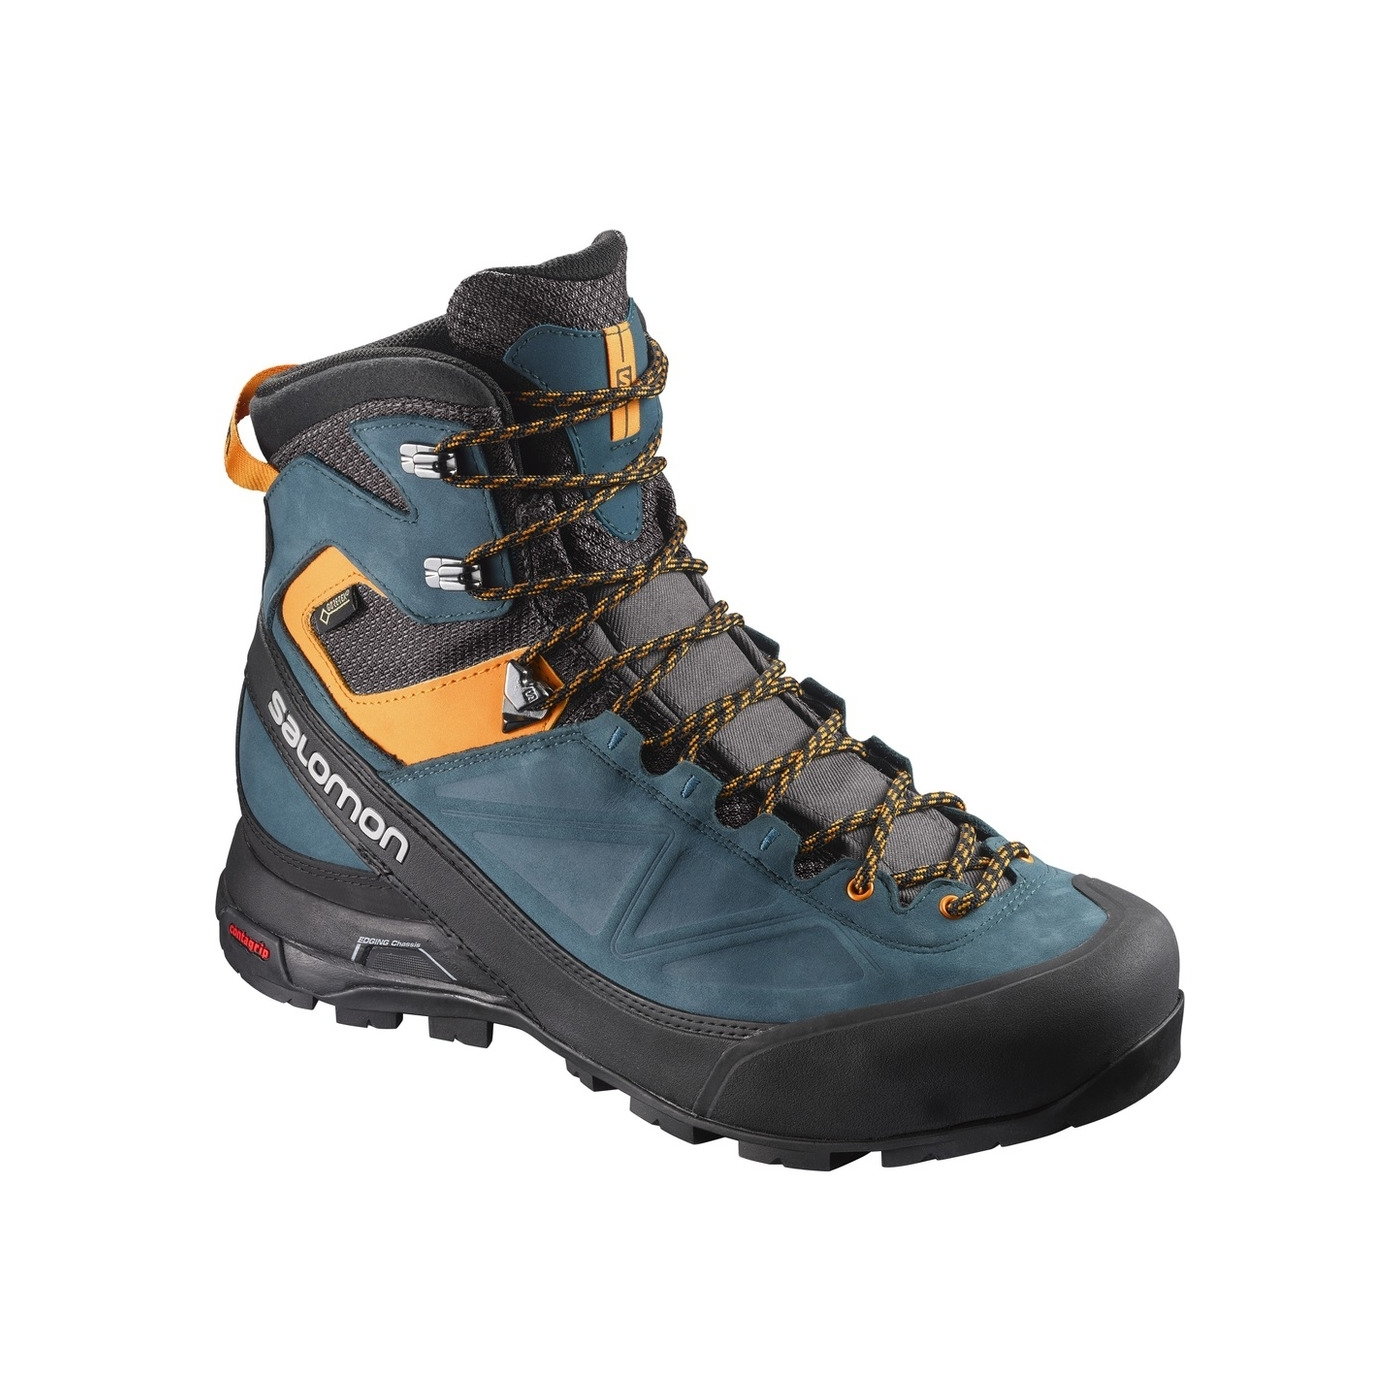 X Mtn Alp Phantom Salomon Gtx Alpinisme Chaussures gyY6bf7